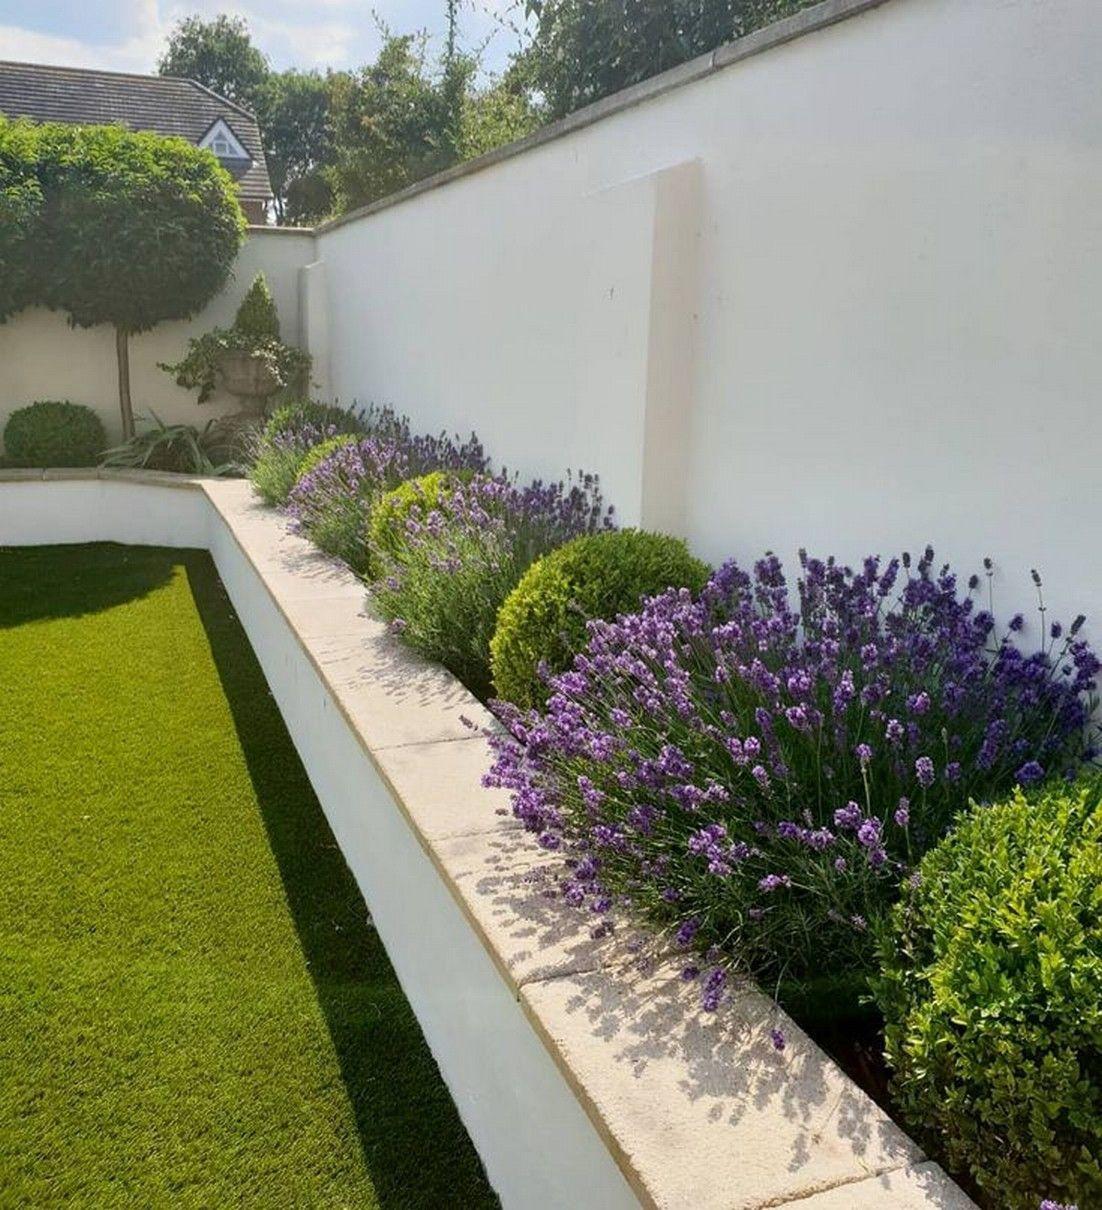 43 Most Beautiful Backyard Landscaping 2019 Backyardlandscaping Landscapingideas Beautifulback Haus Und Garten Minimalistischer Garten Garten Landschaftsbau